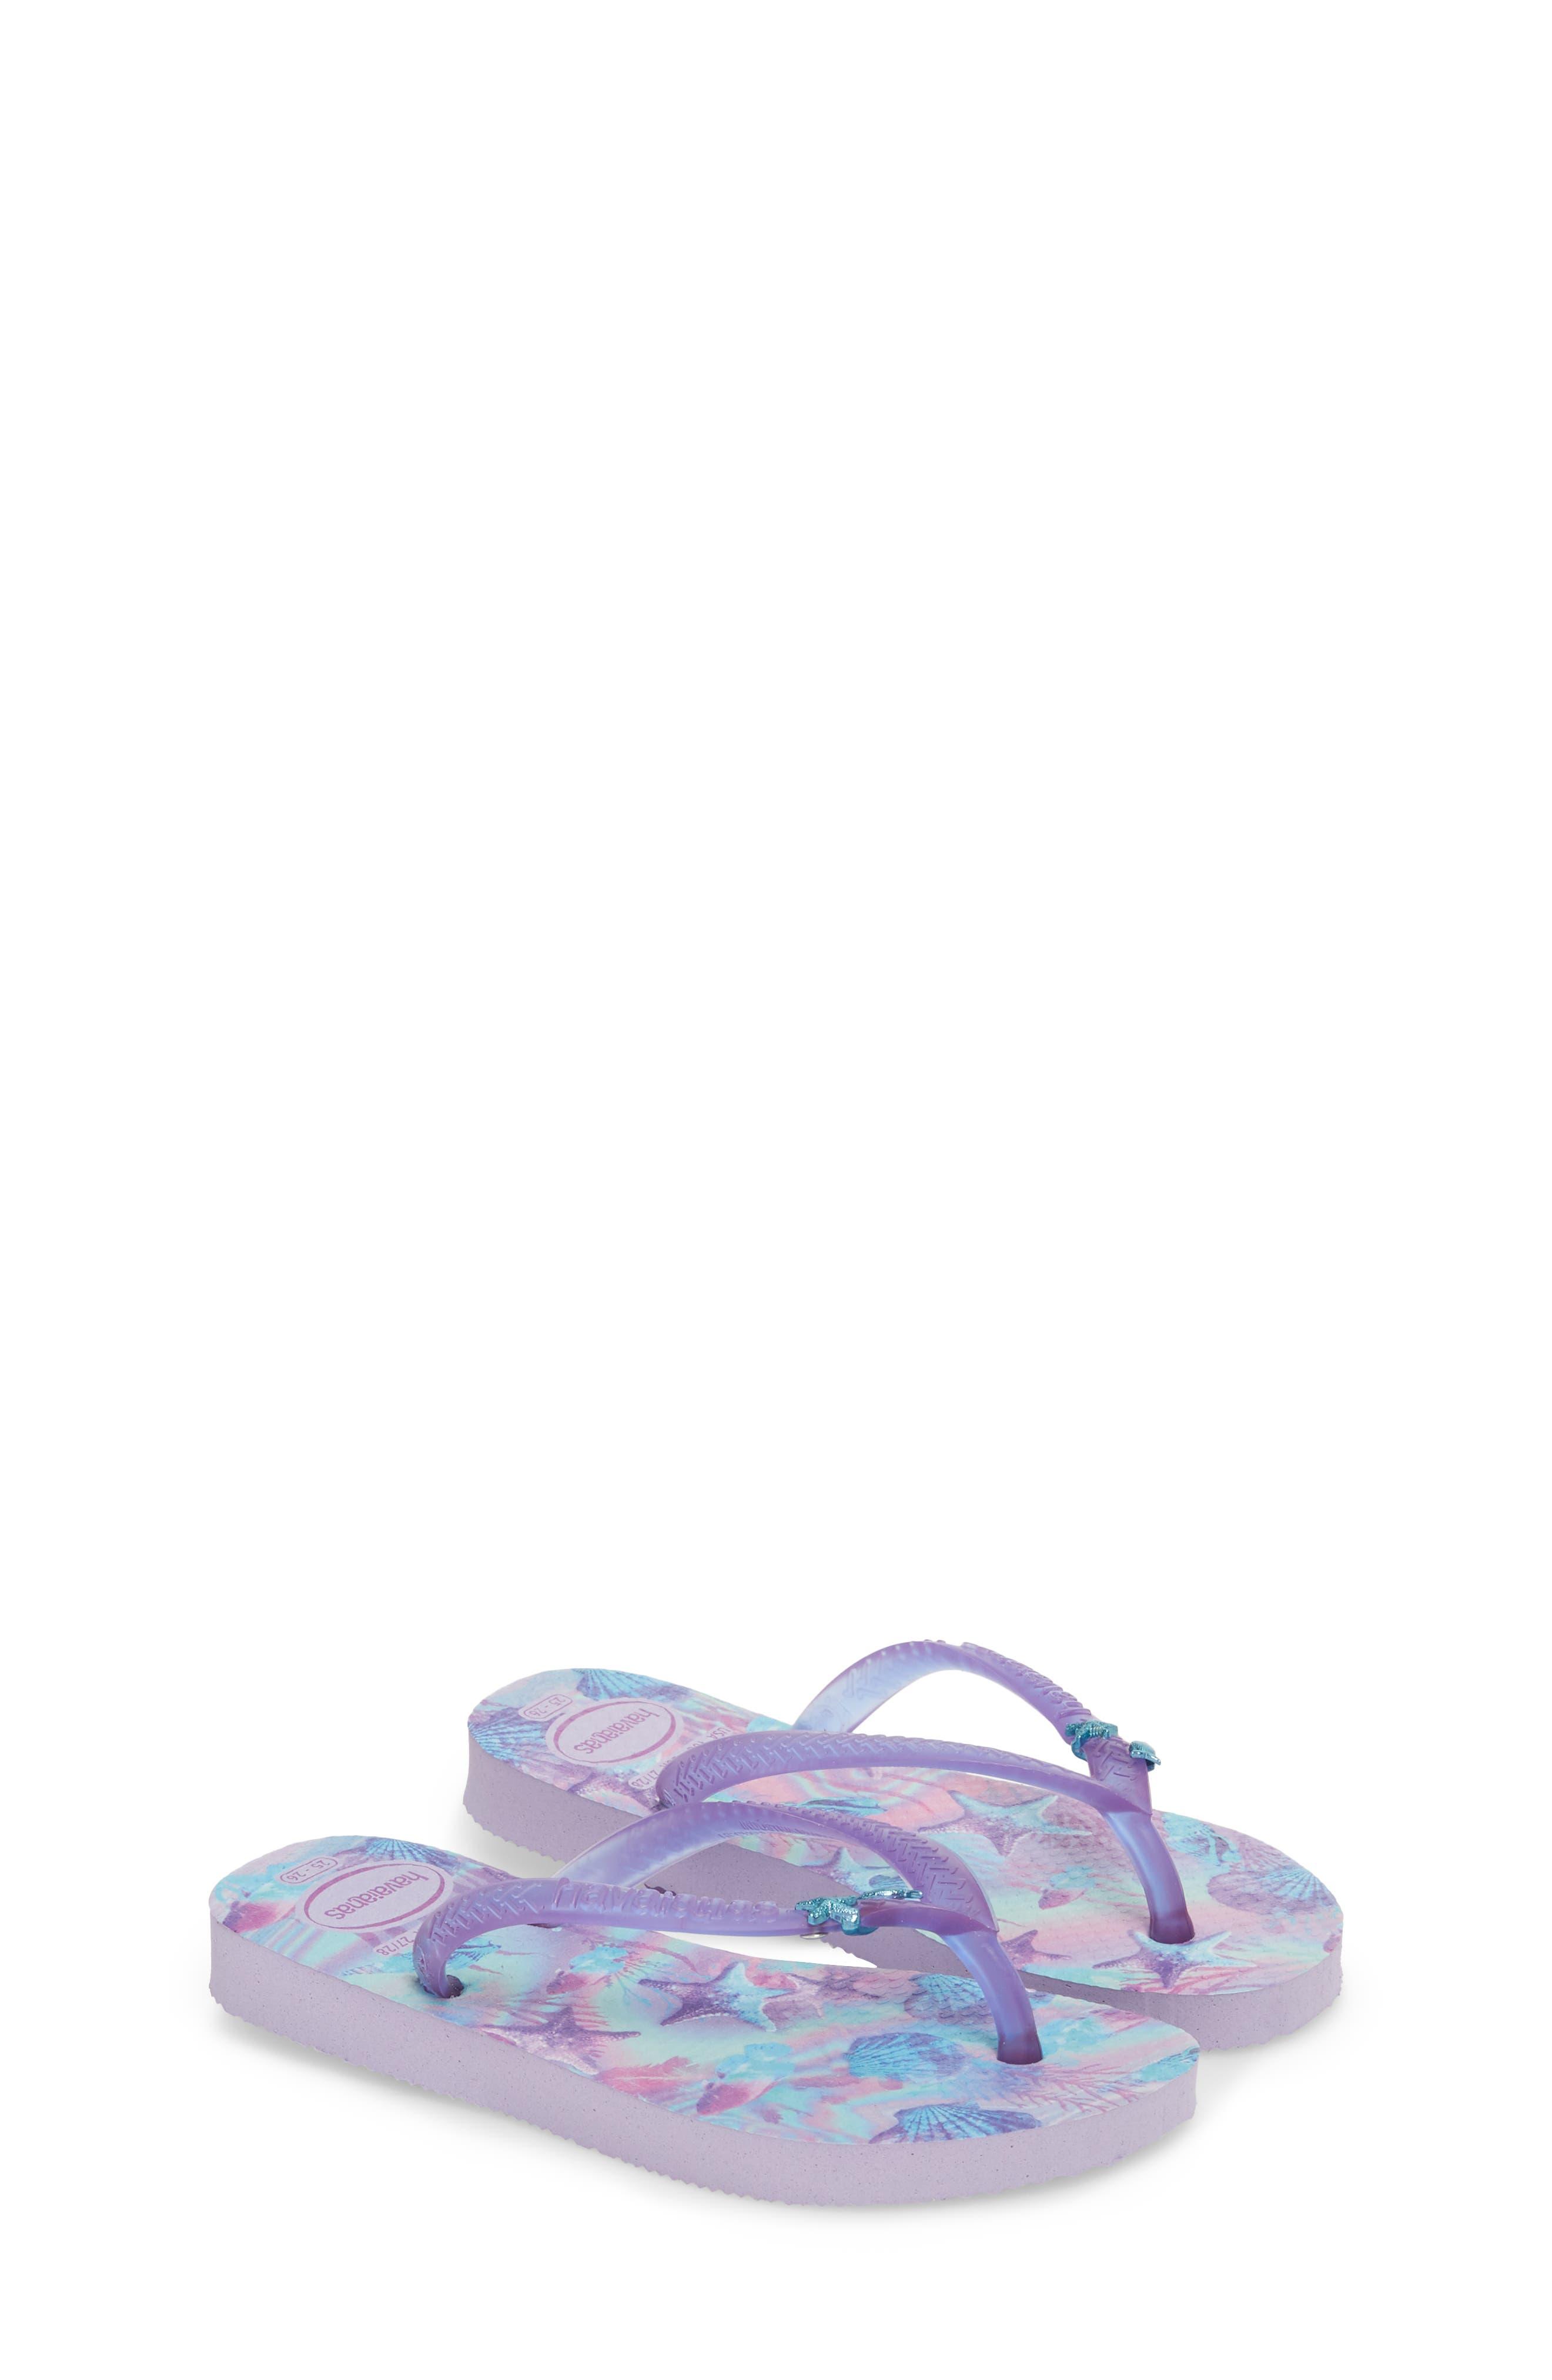 Havianas Slim Summer Flip Flop,                             Alternate thumbnail 3, color,                             Lavender